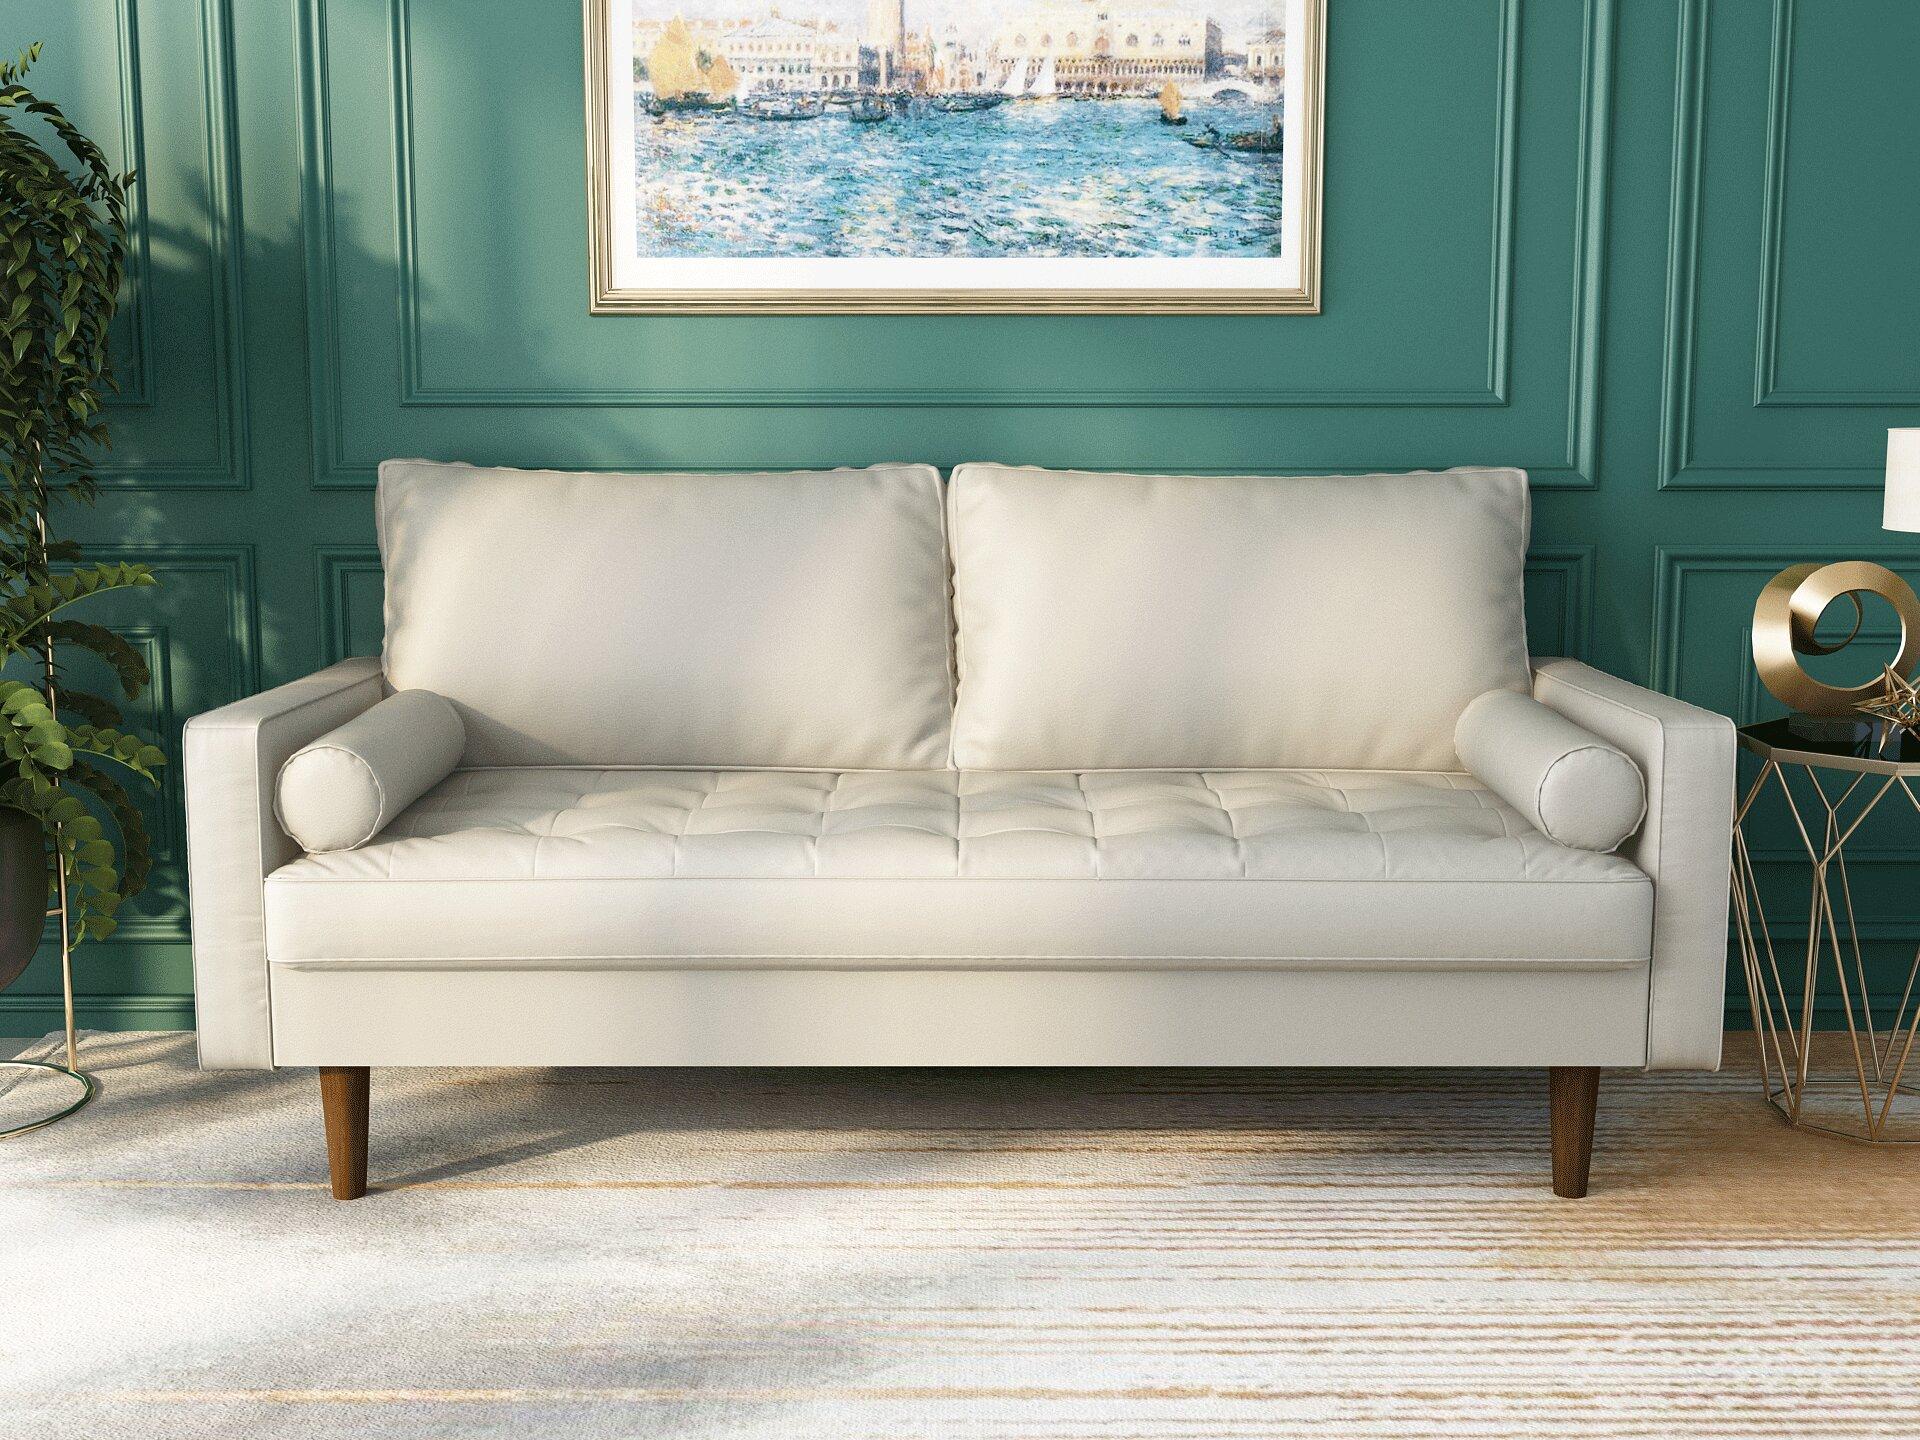 White Sofas Couches Free Shipping Over 35 Wayfair